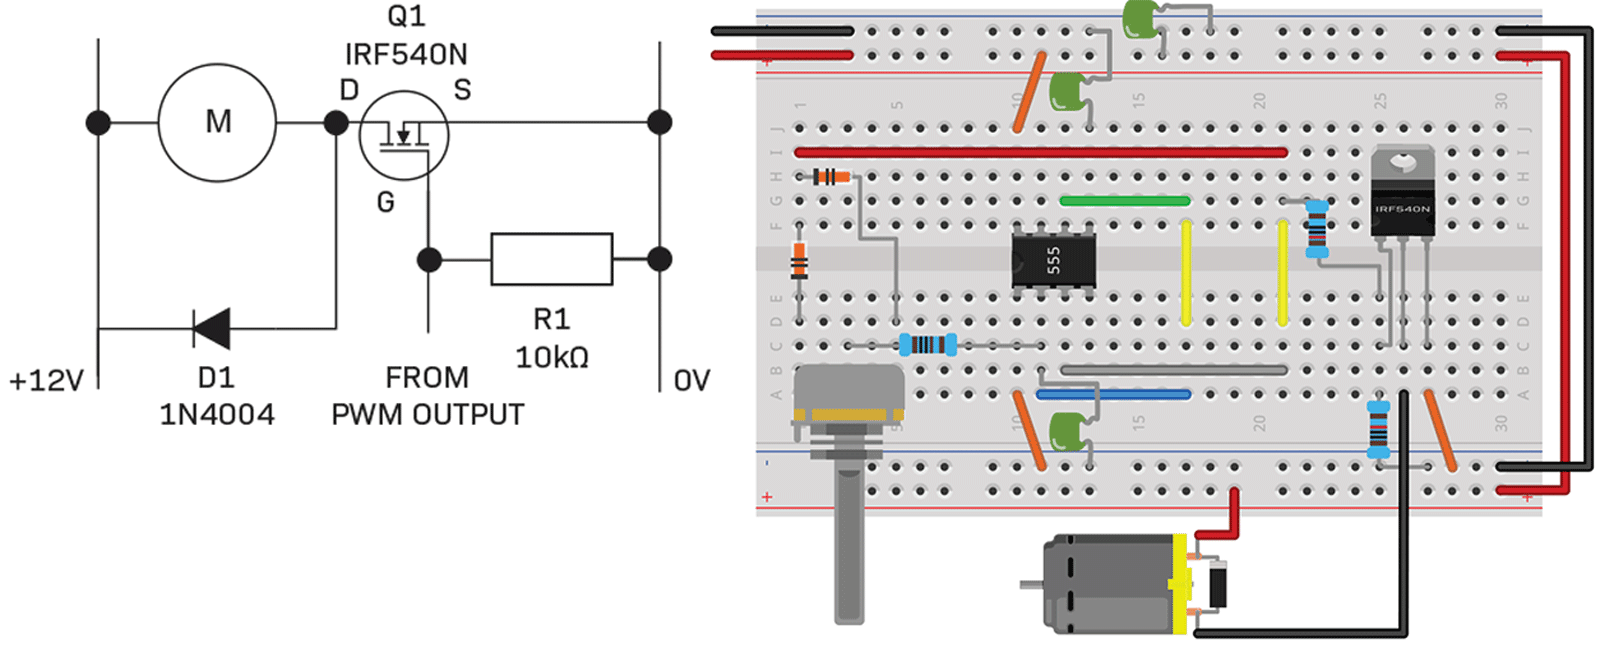 hight resolution of ogo pwm wiring diagram 7 wiring diagram mega ogo pwm wiring diagram 7